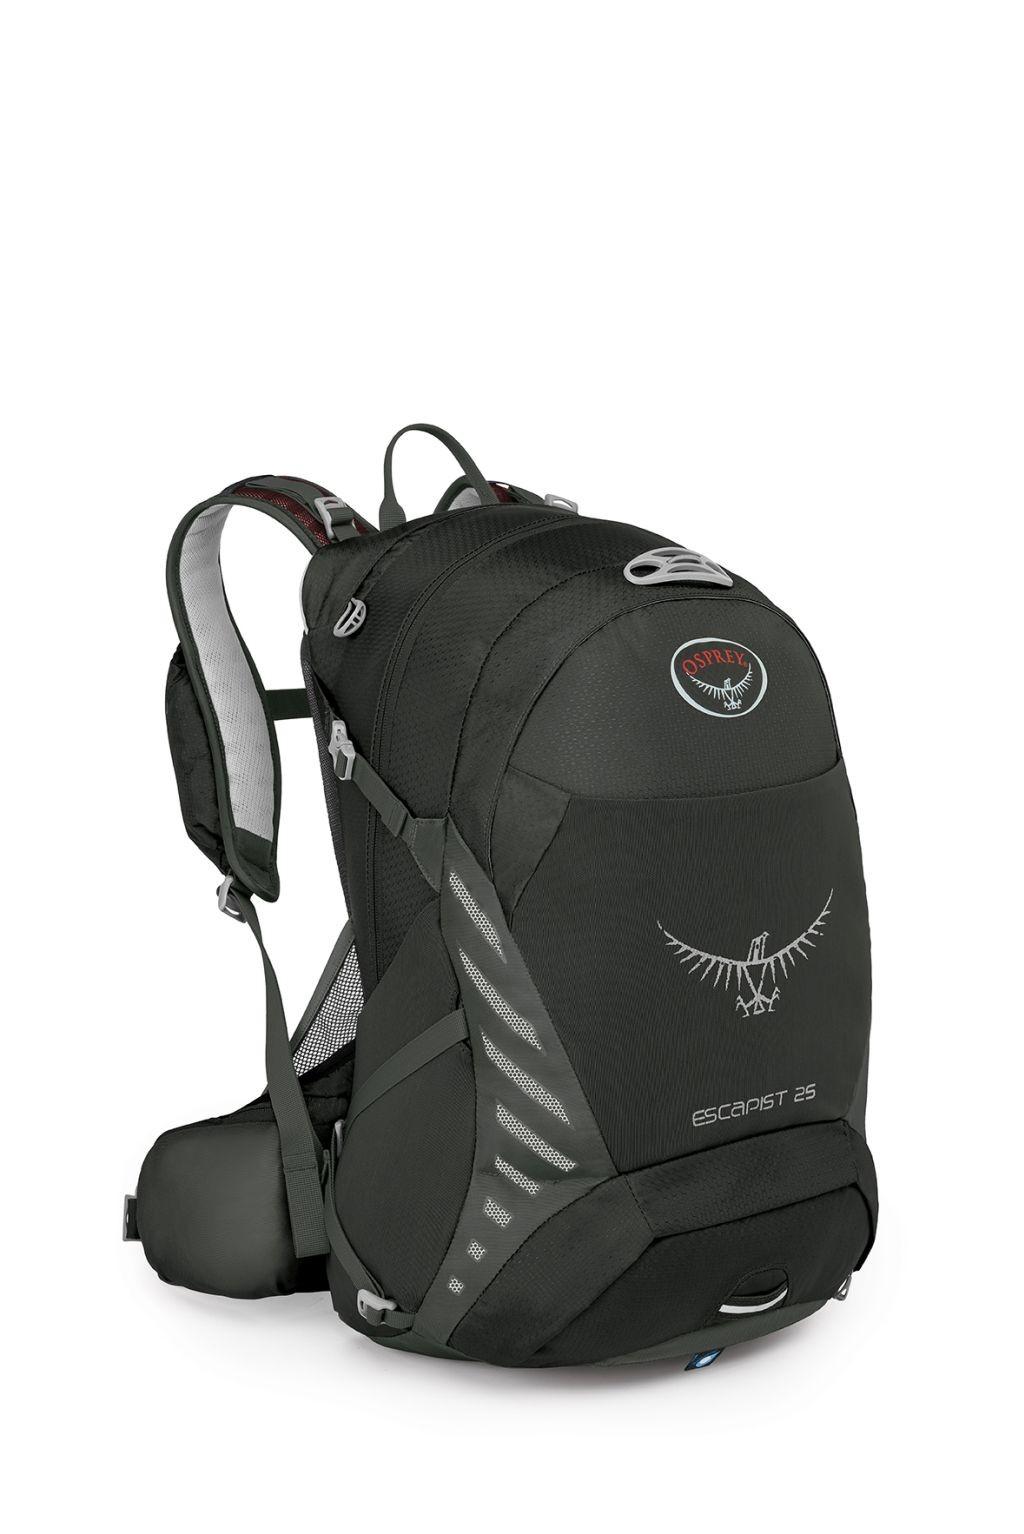 Osprey Escapist 25